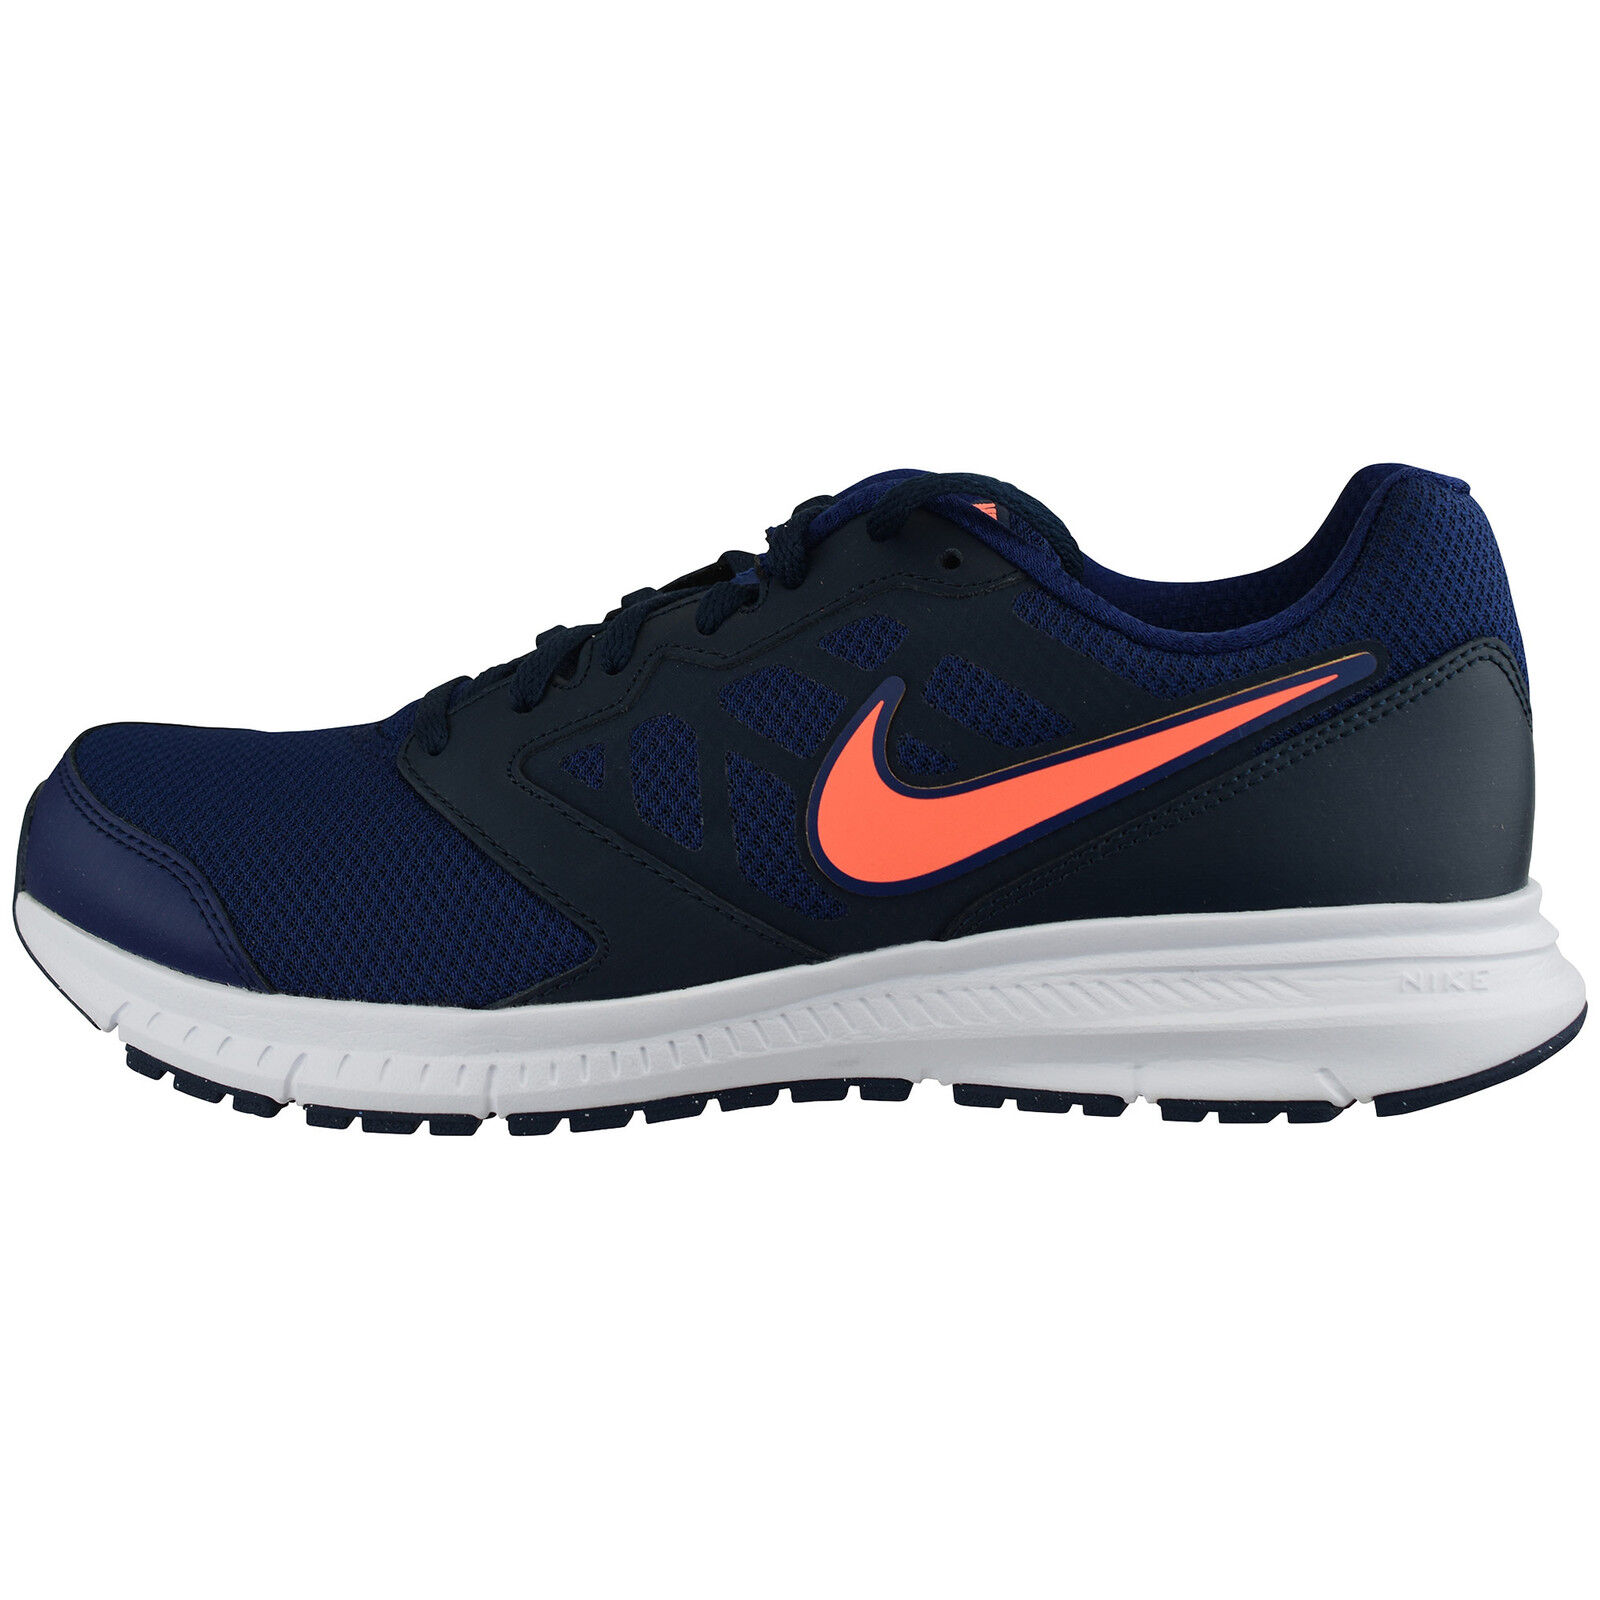 WMNS Joggen Nike Downshifter 6 684765-406 Joggen WMNS Jogging Laufschuhe Frauen fab7de